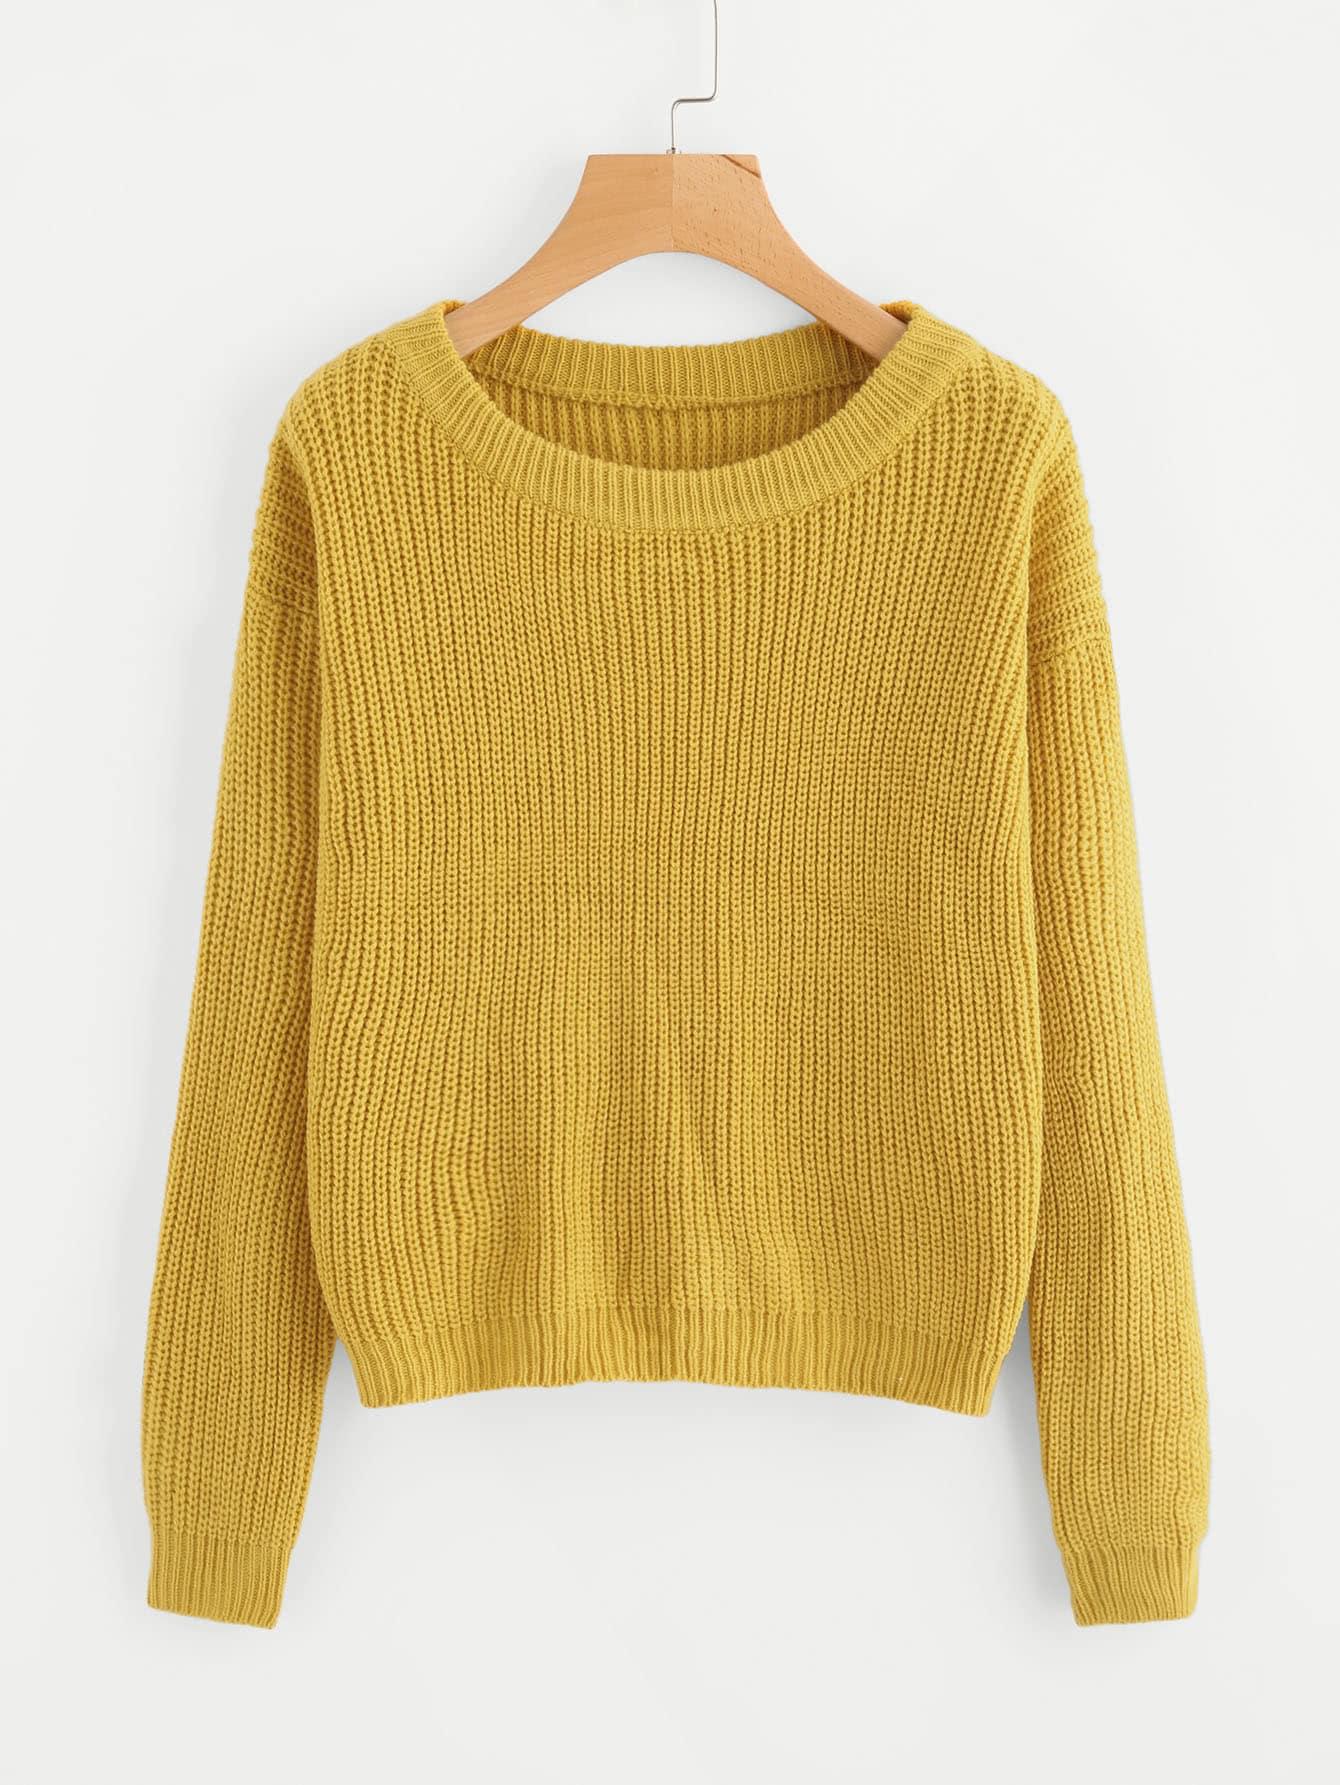 Drop Shoulder Solid Sweater drop shoulder two tone eyelet sweater